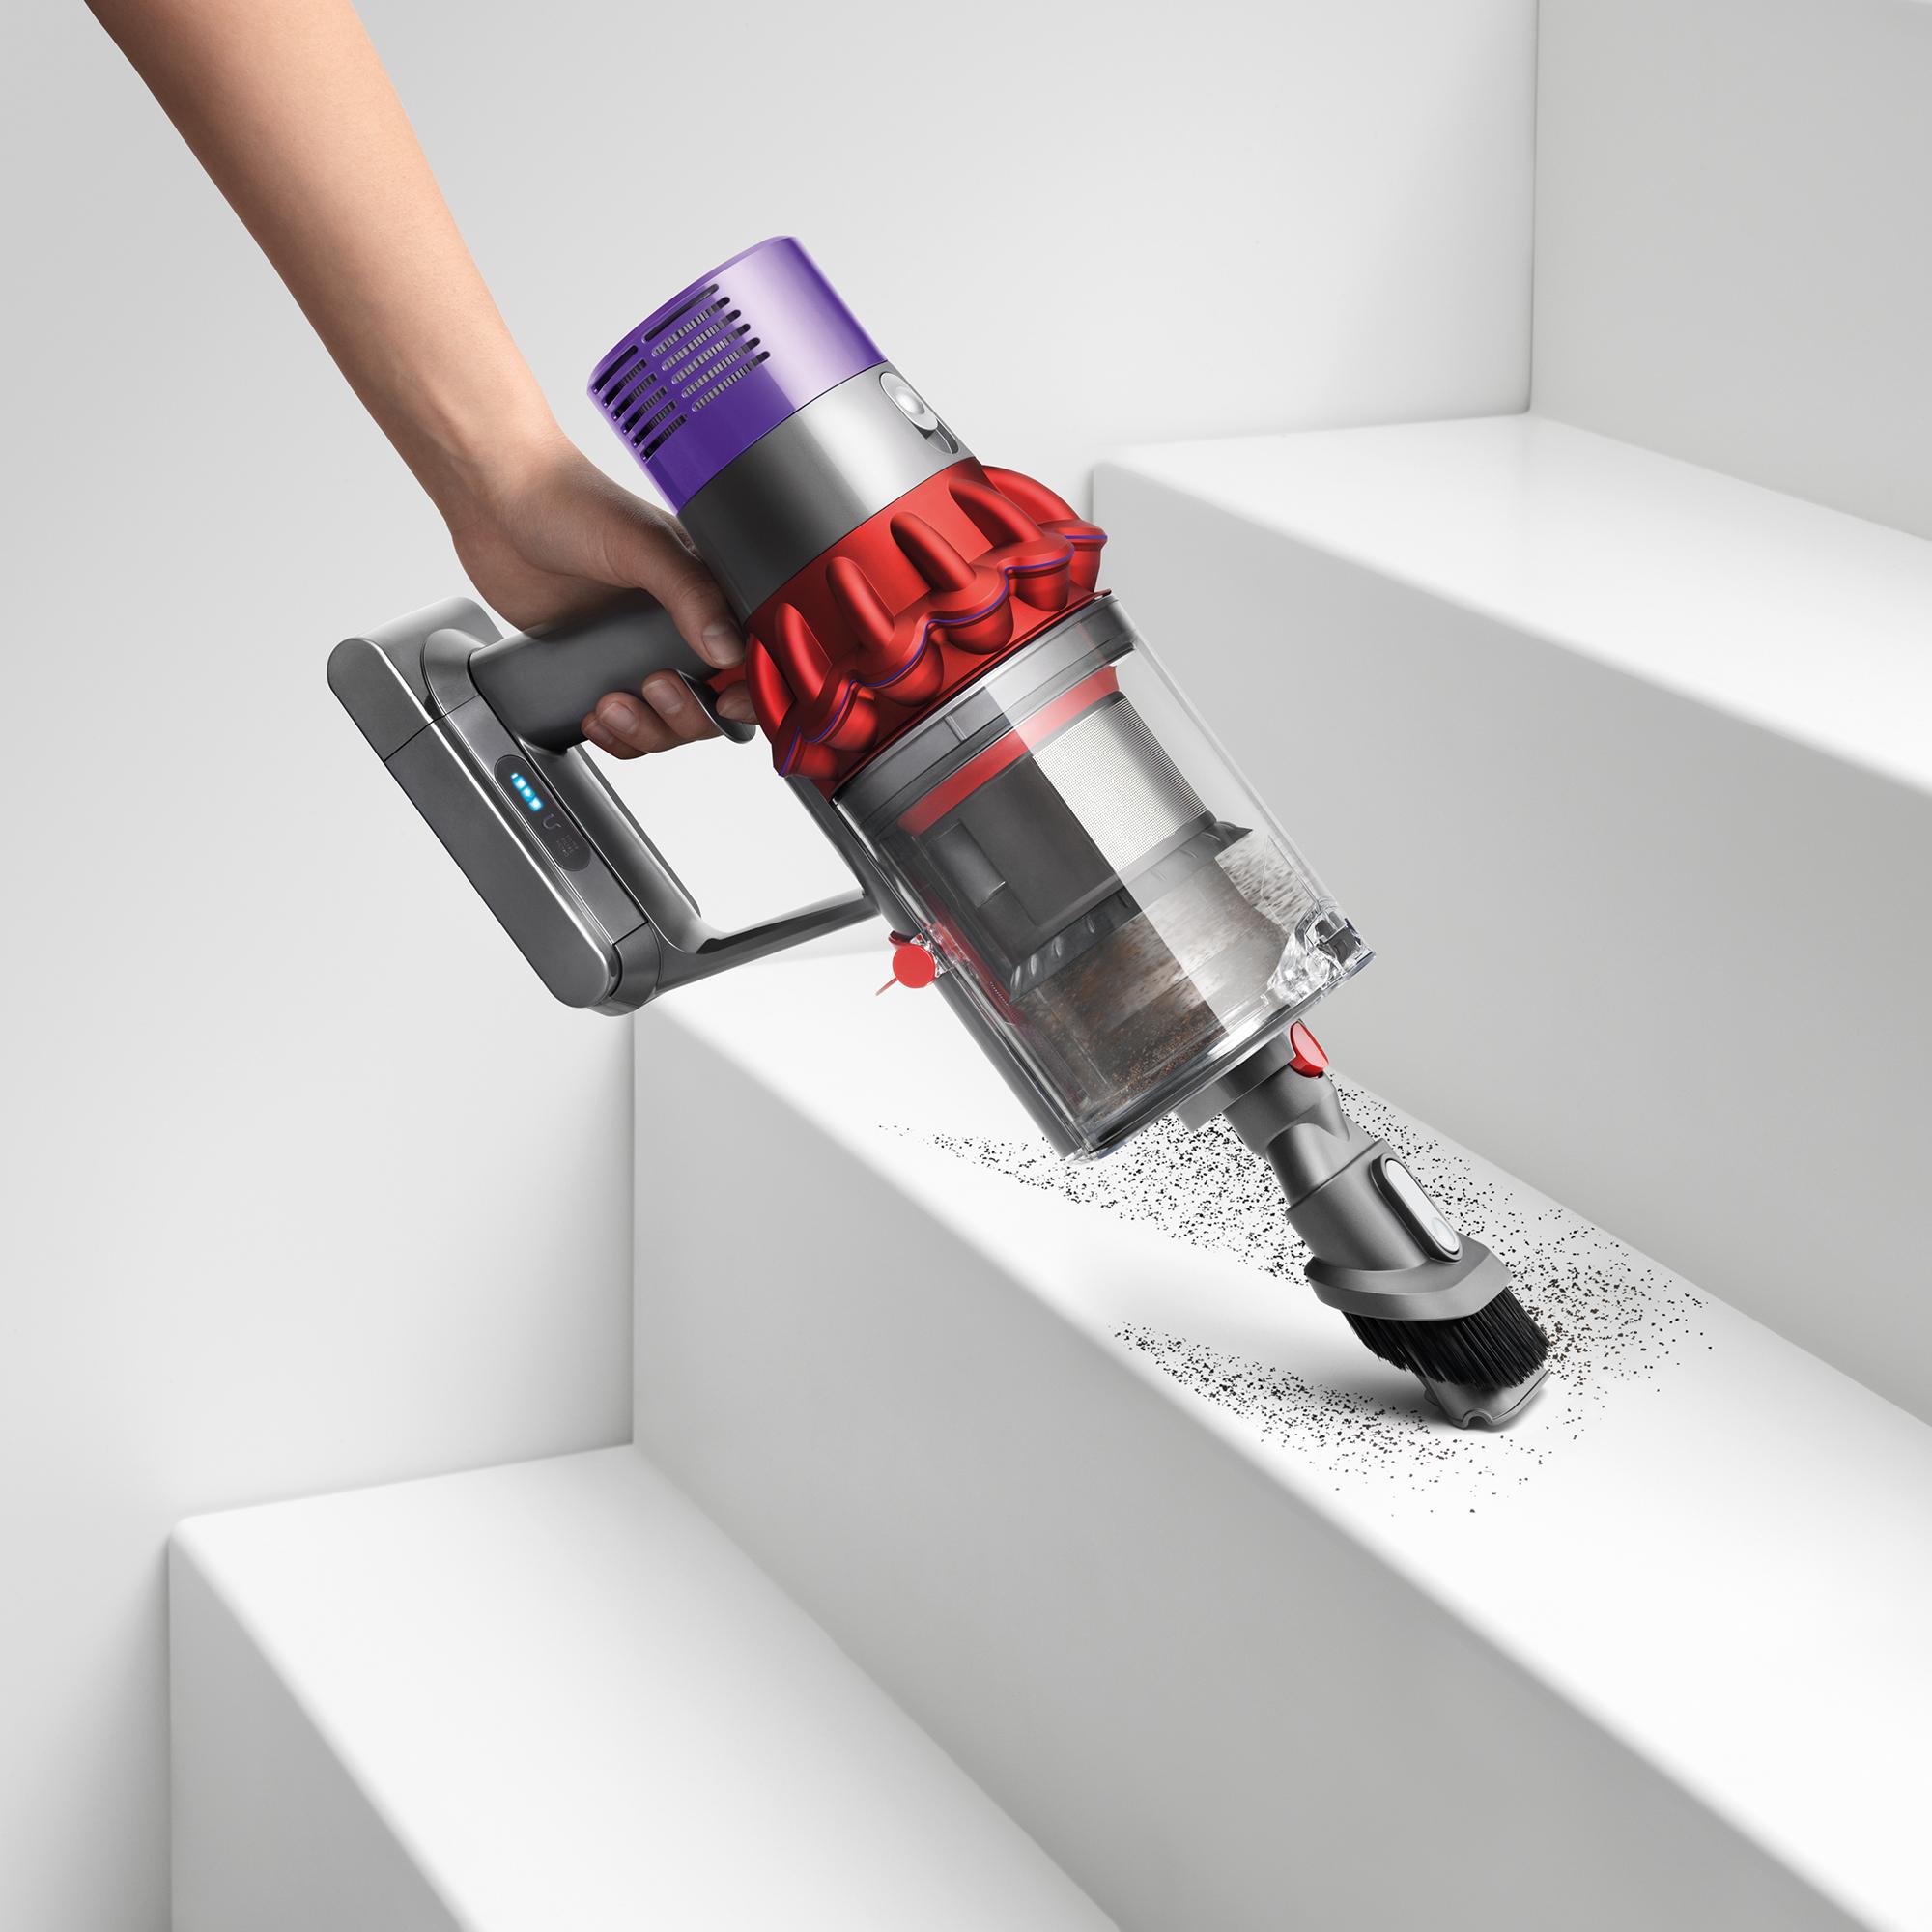 Dyson-V10-Animal-Pro-Cordless-Vacuum-Cleaner-Refurbished thumbnail 26